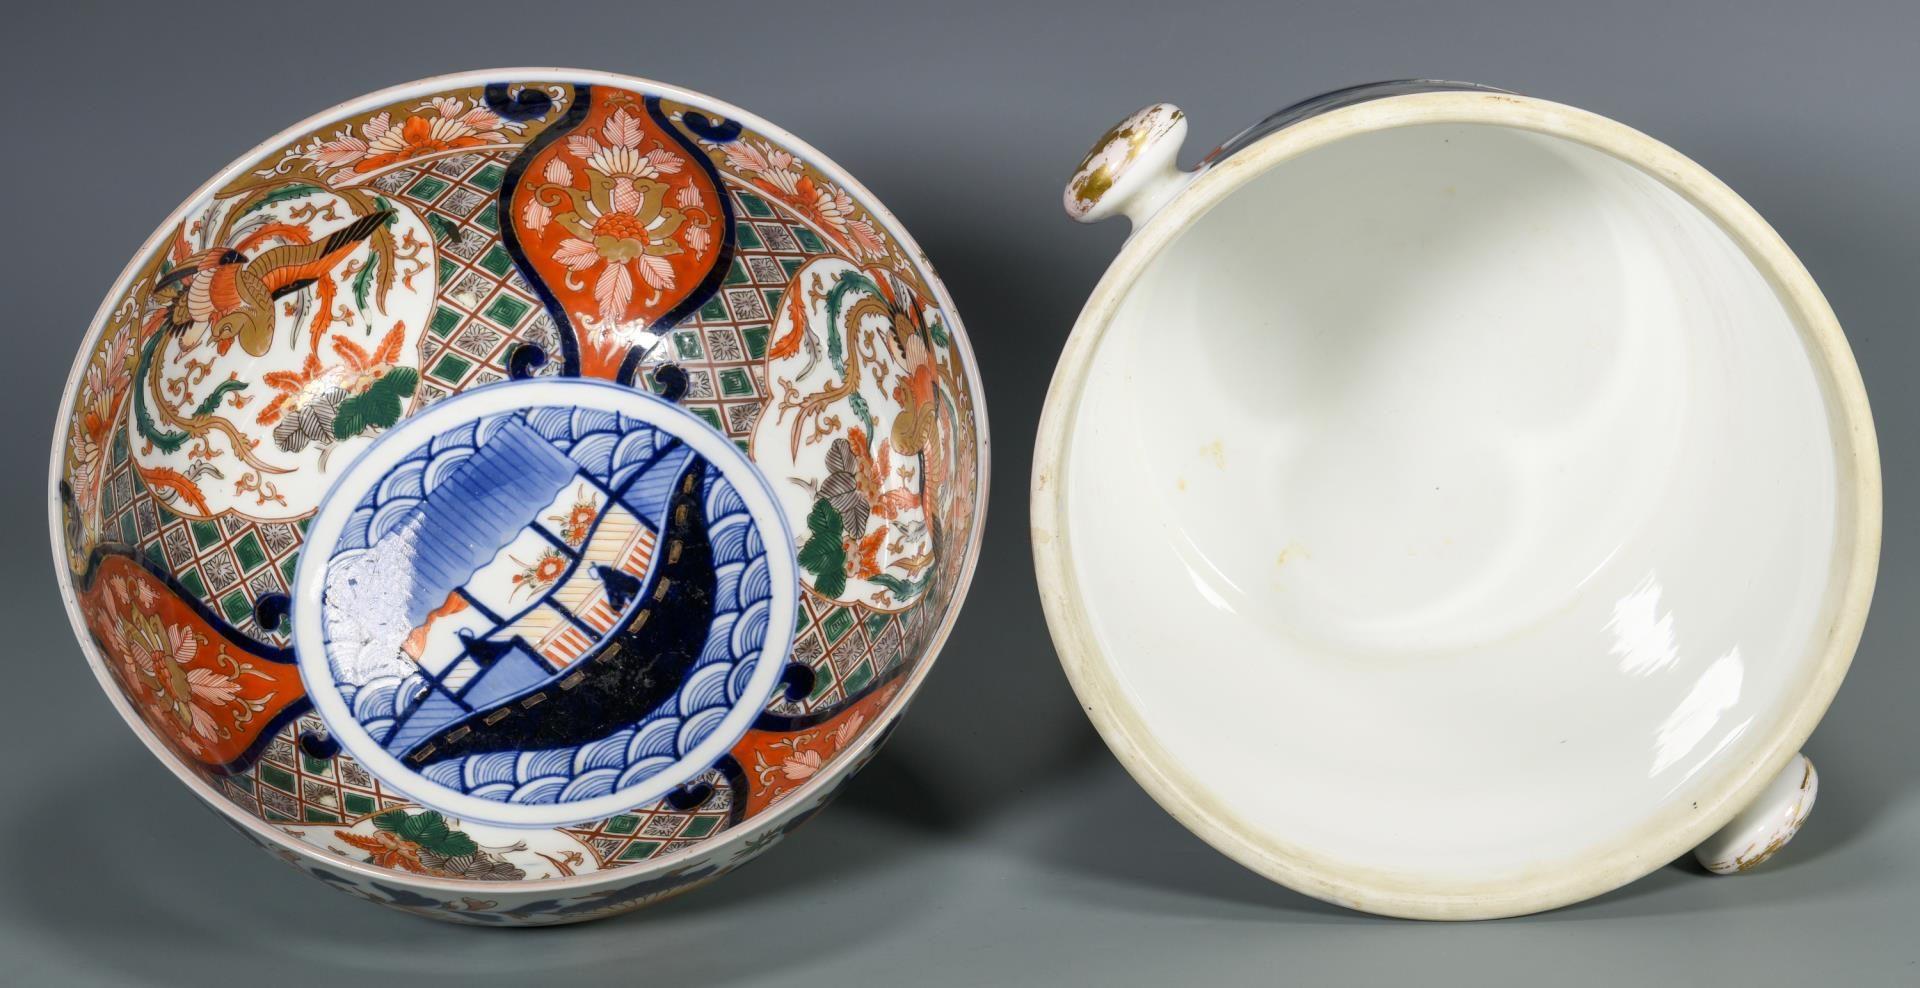 Lot 138: 4 Asian Themed Porcelain Items